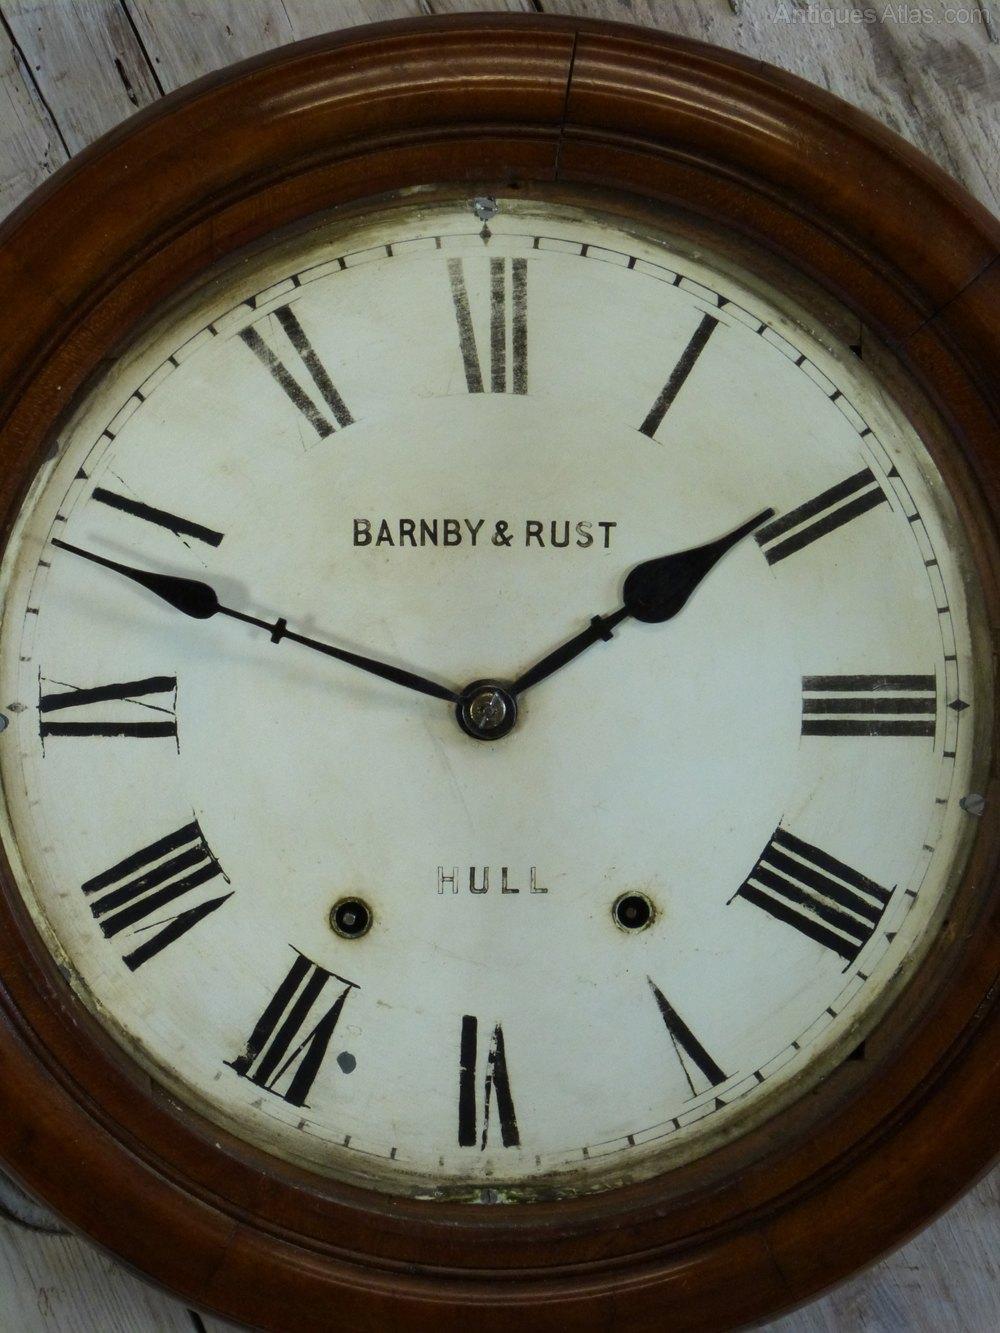 Antiques atlas barnby rust of hull railway wall clock barnby rust of hull railway wall clock antique station wall clocks amipublicfo Gallery